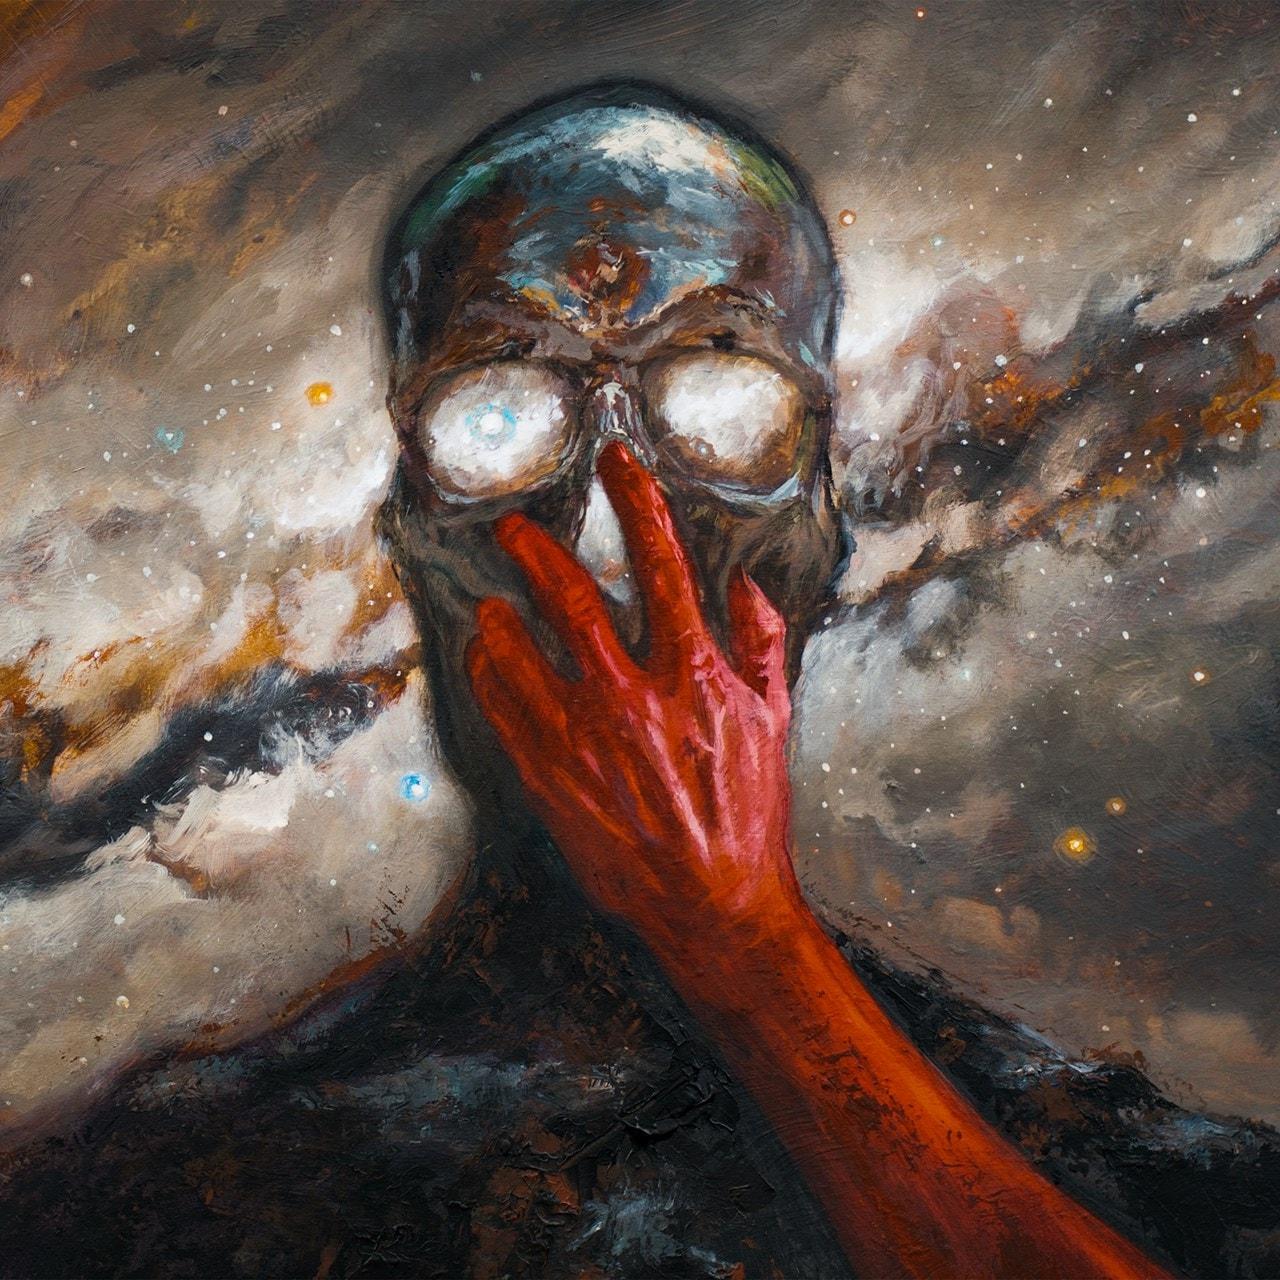 Bury Tomorrow - Cannibal - LP & hmv Vault Birmingham Event Entry - 1